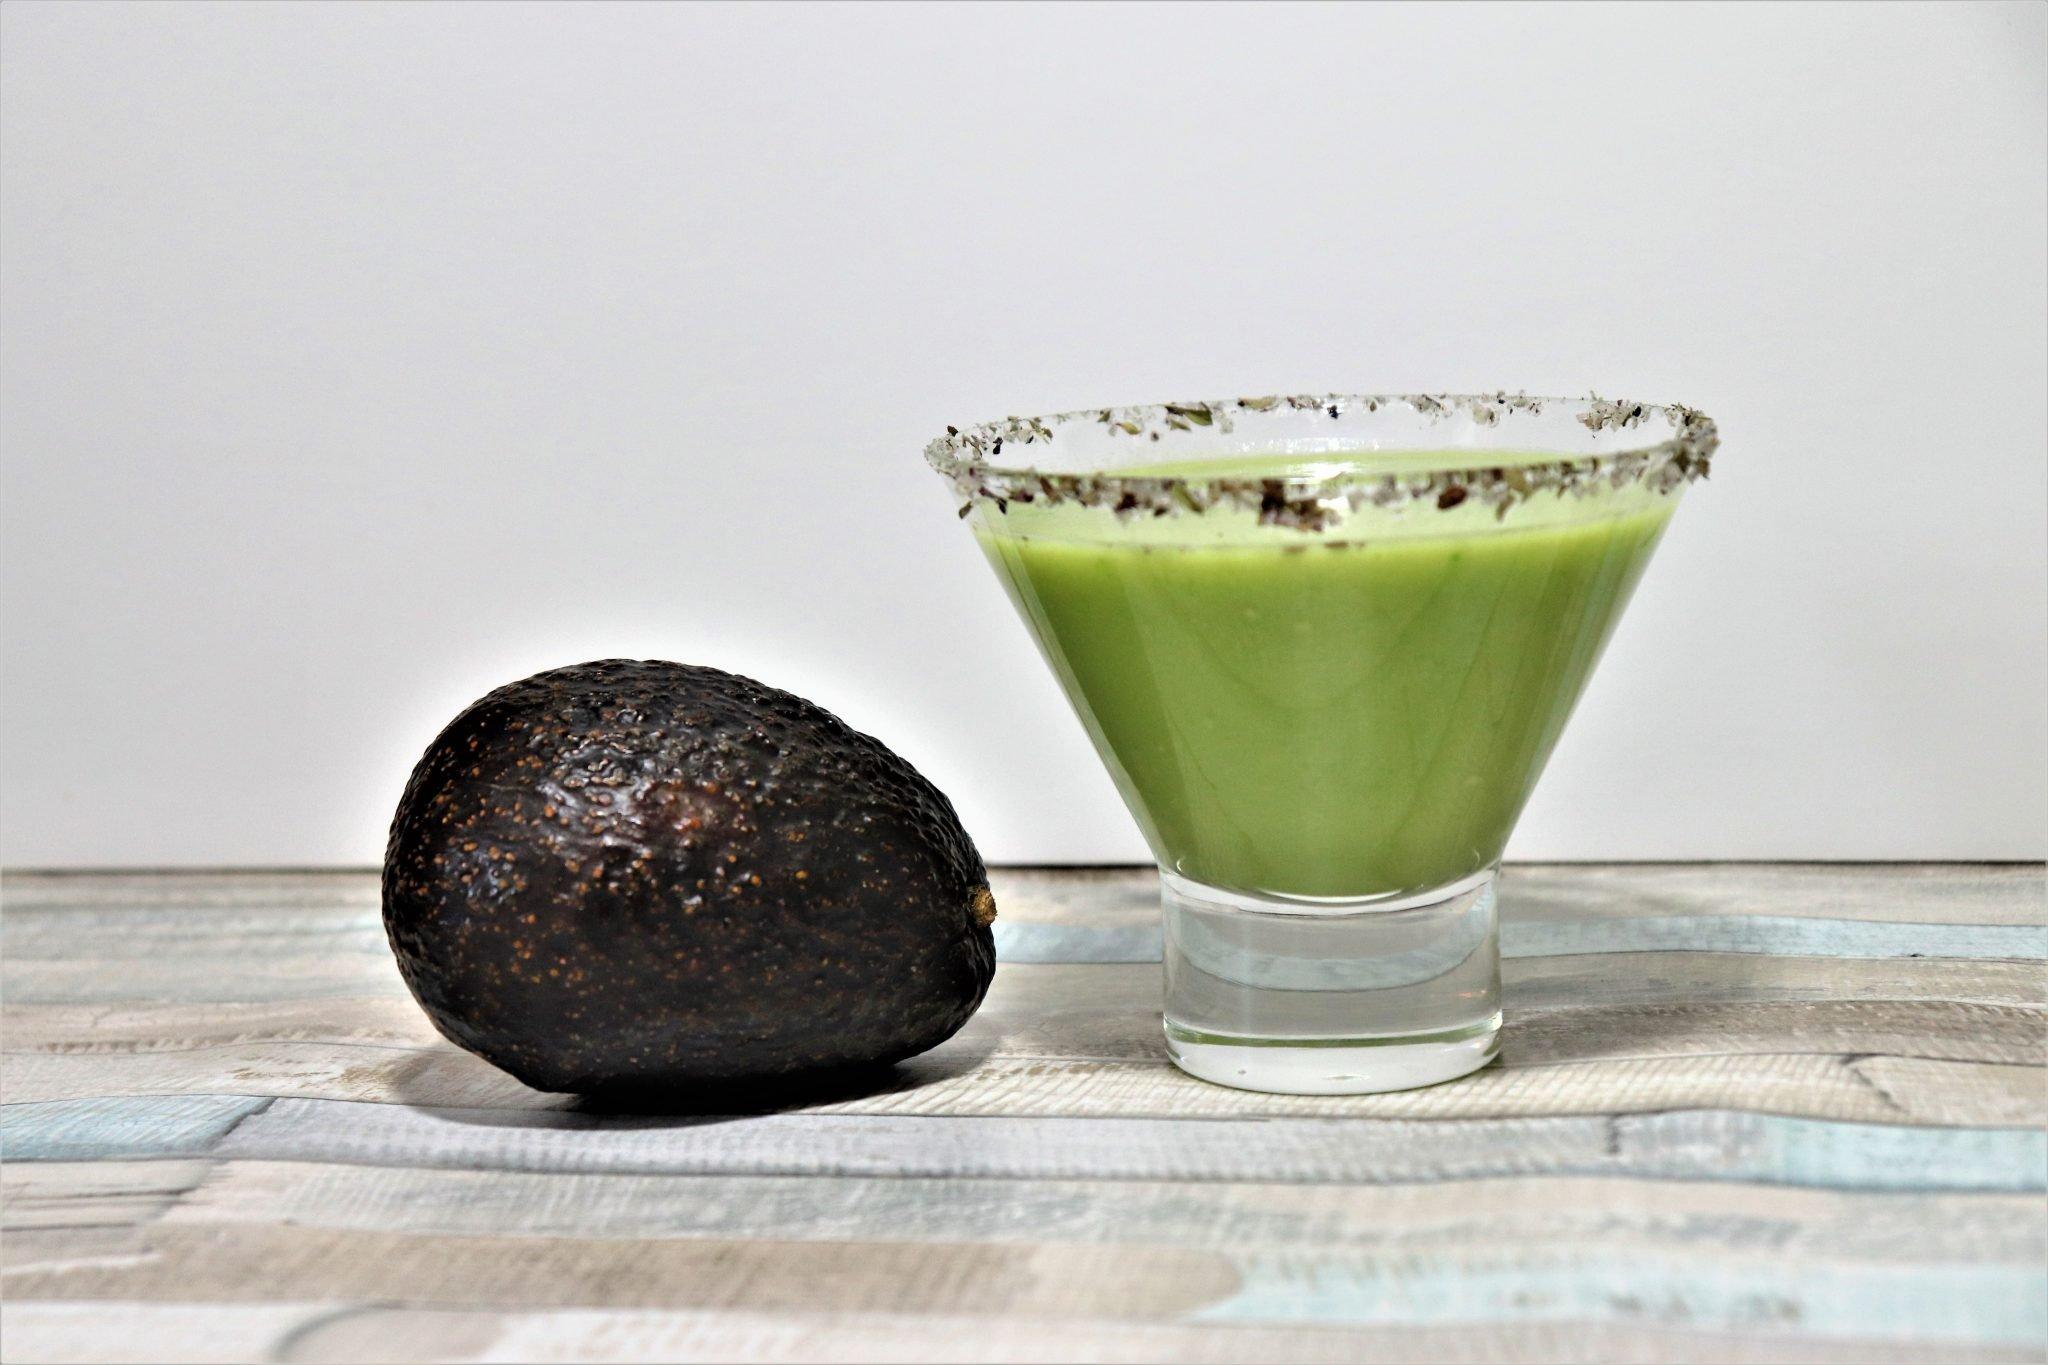 Avocado margarita recipe - Disney in your Day